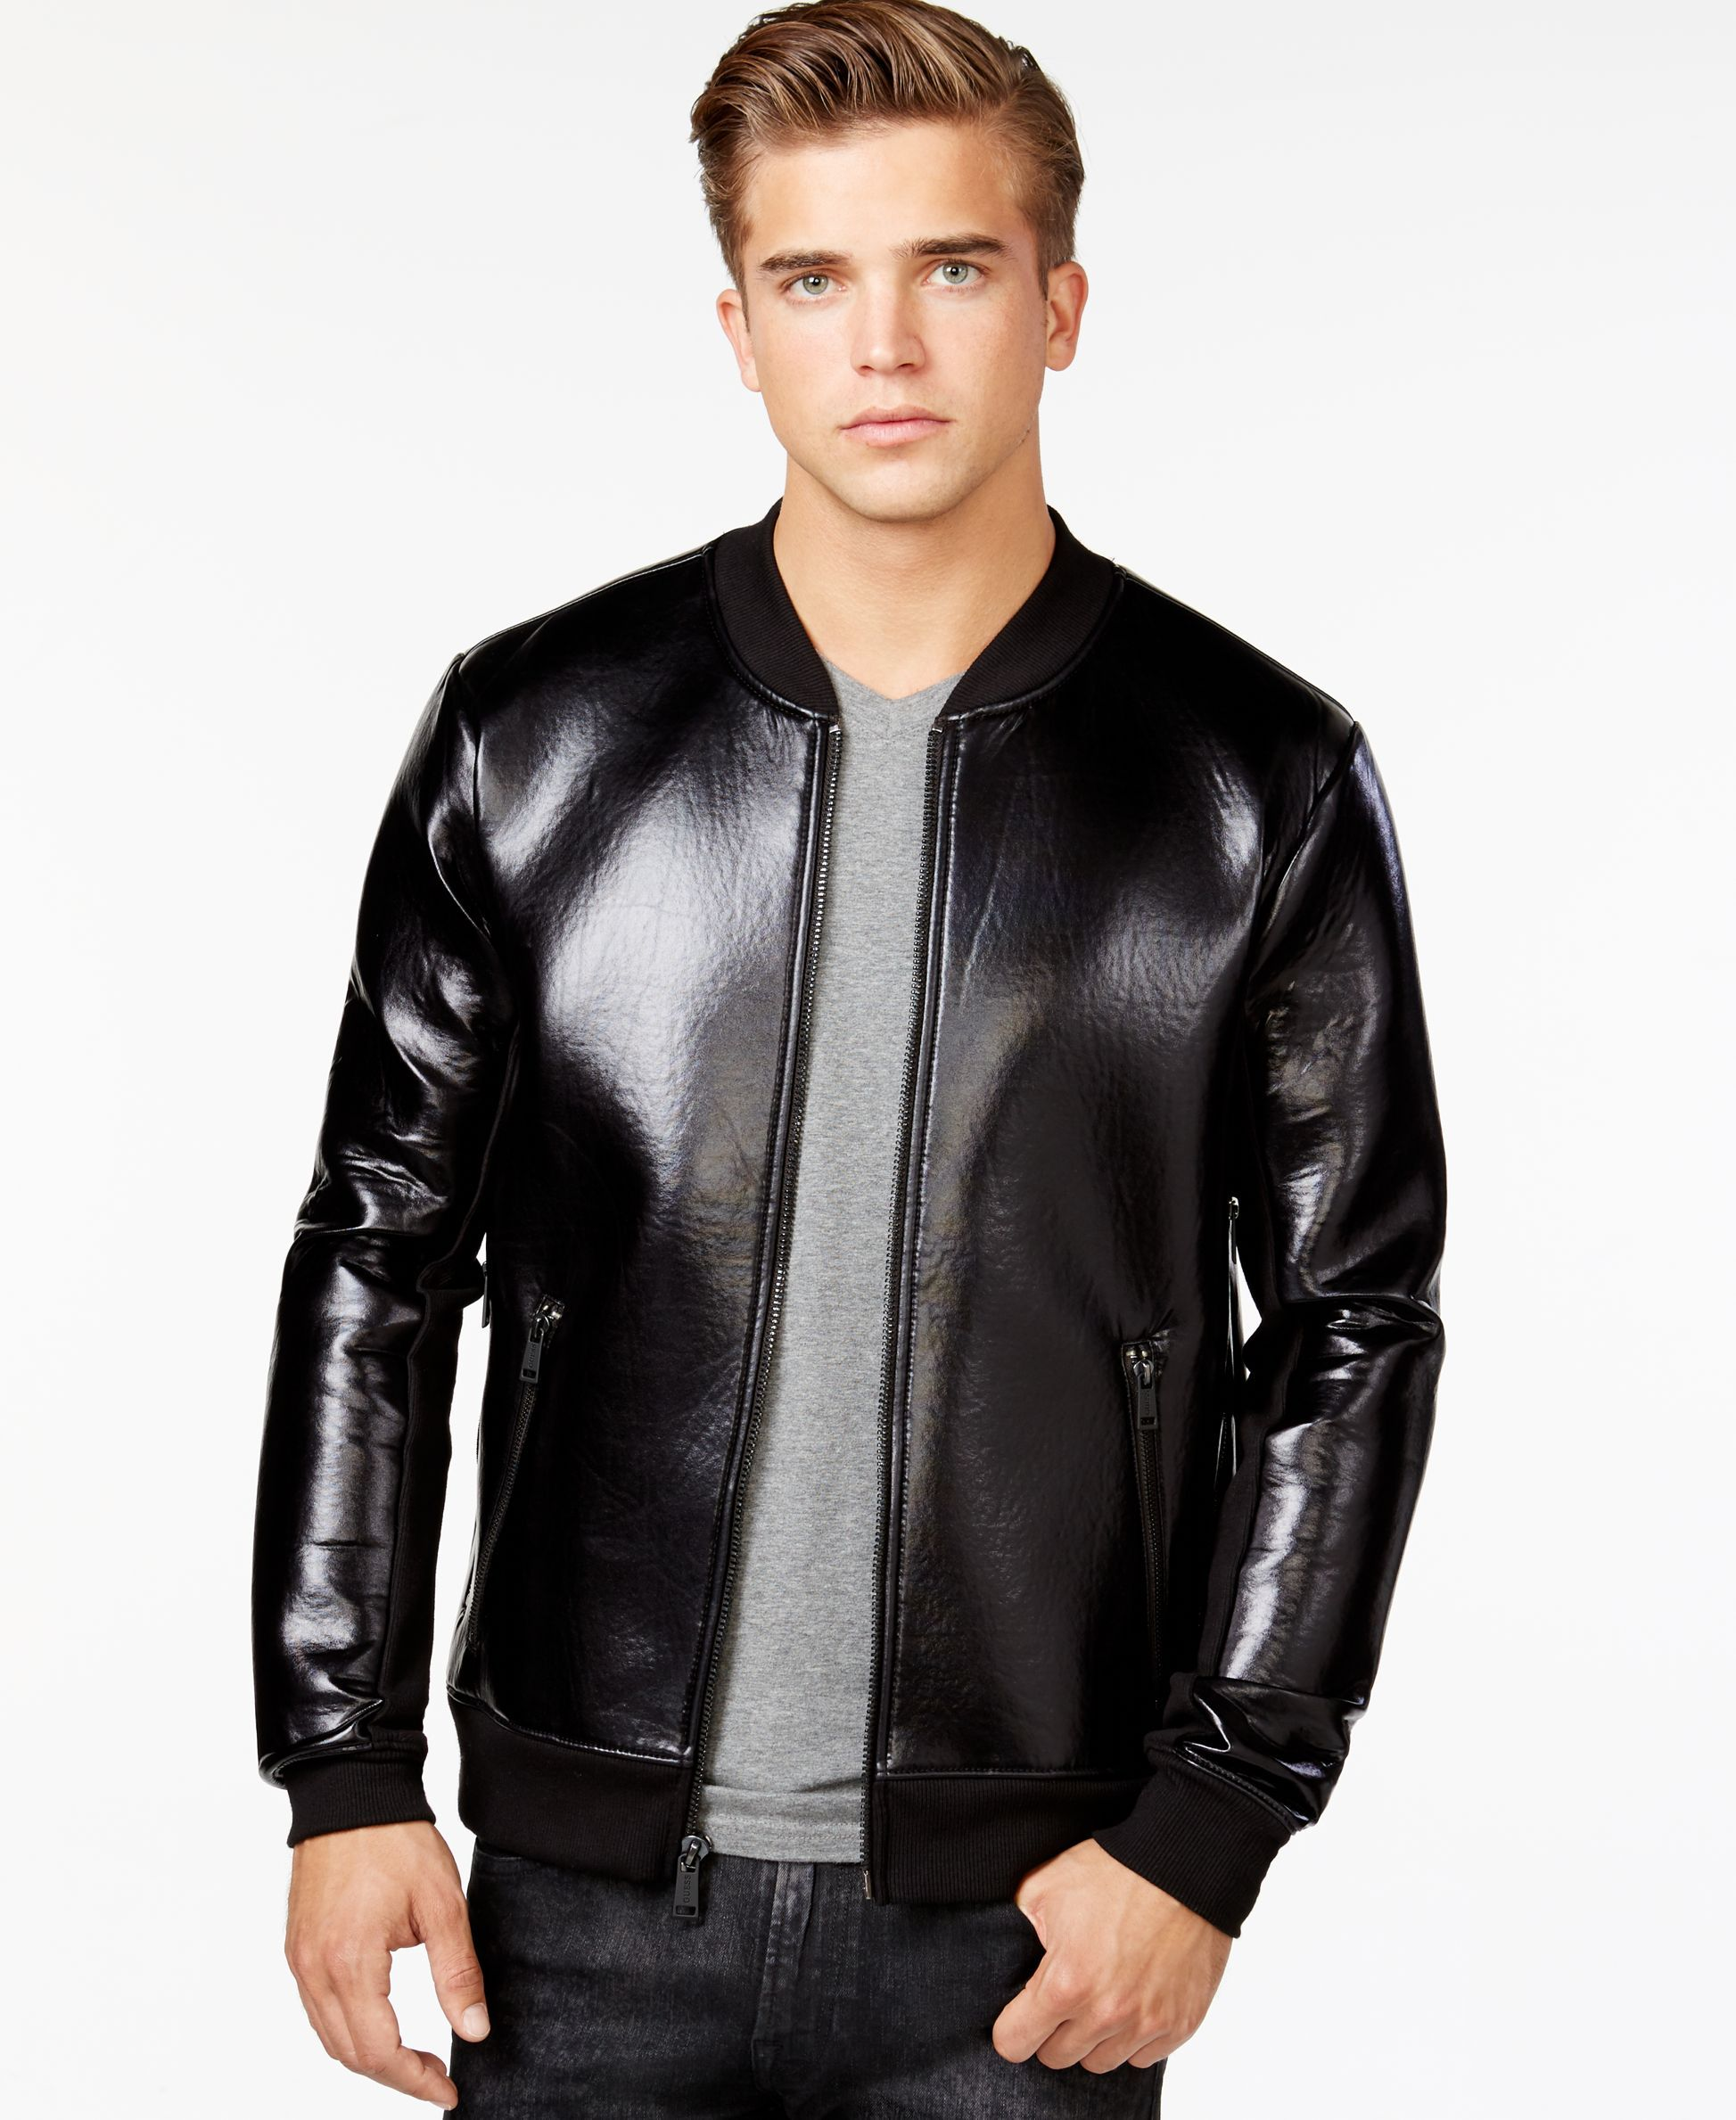 Guess Neoprene Zip Bomber Jacket Coats Jackets Men Macy S Leather Jacket Men Leather Jeans Men Leather Jacket Black [ 2378 x 1947 Pixel ]